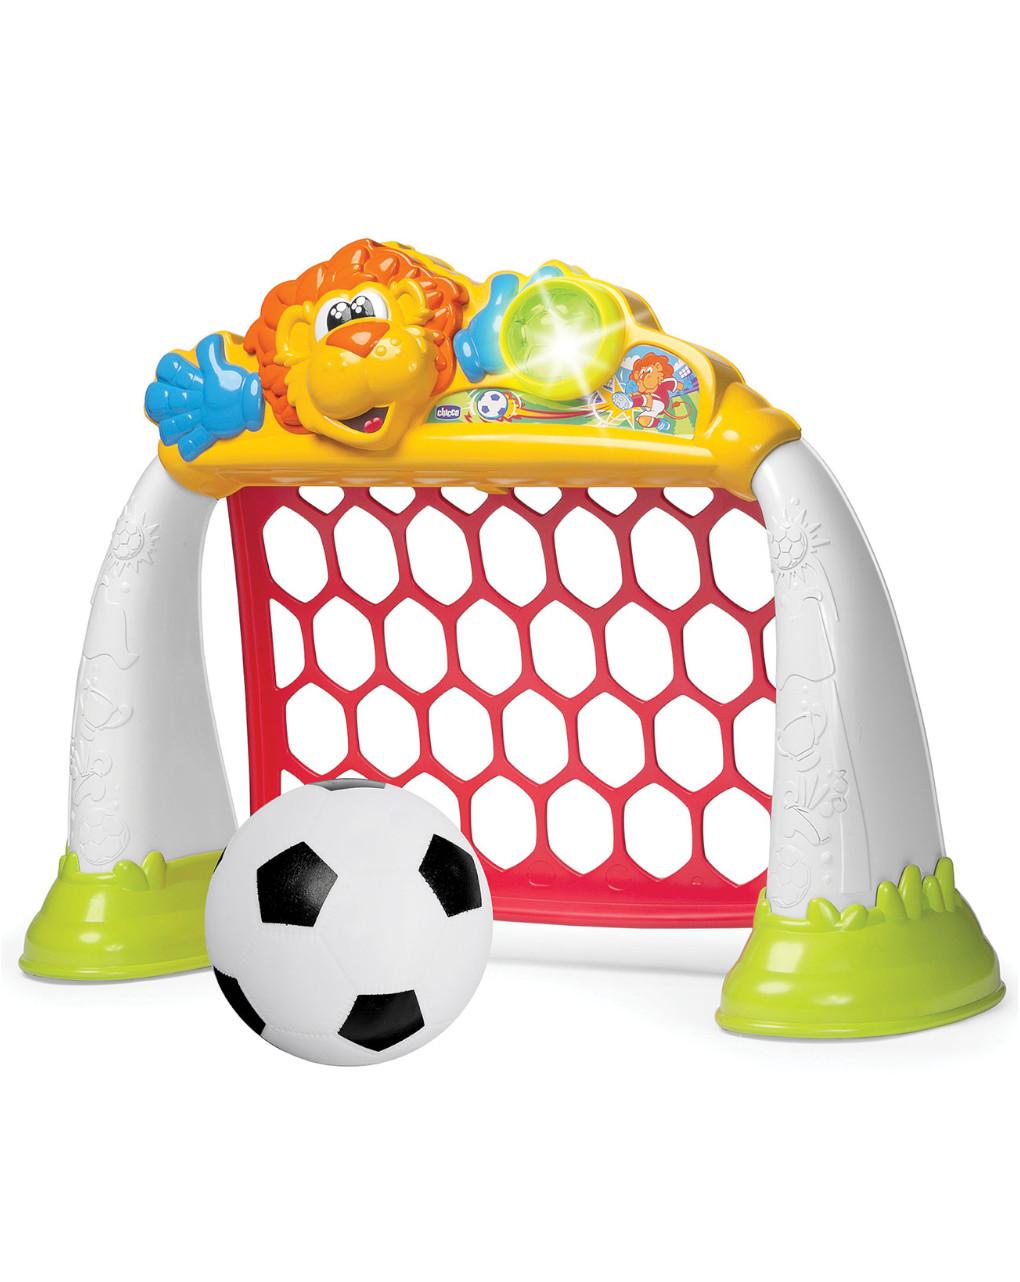 Goal league pro - Chicco